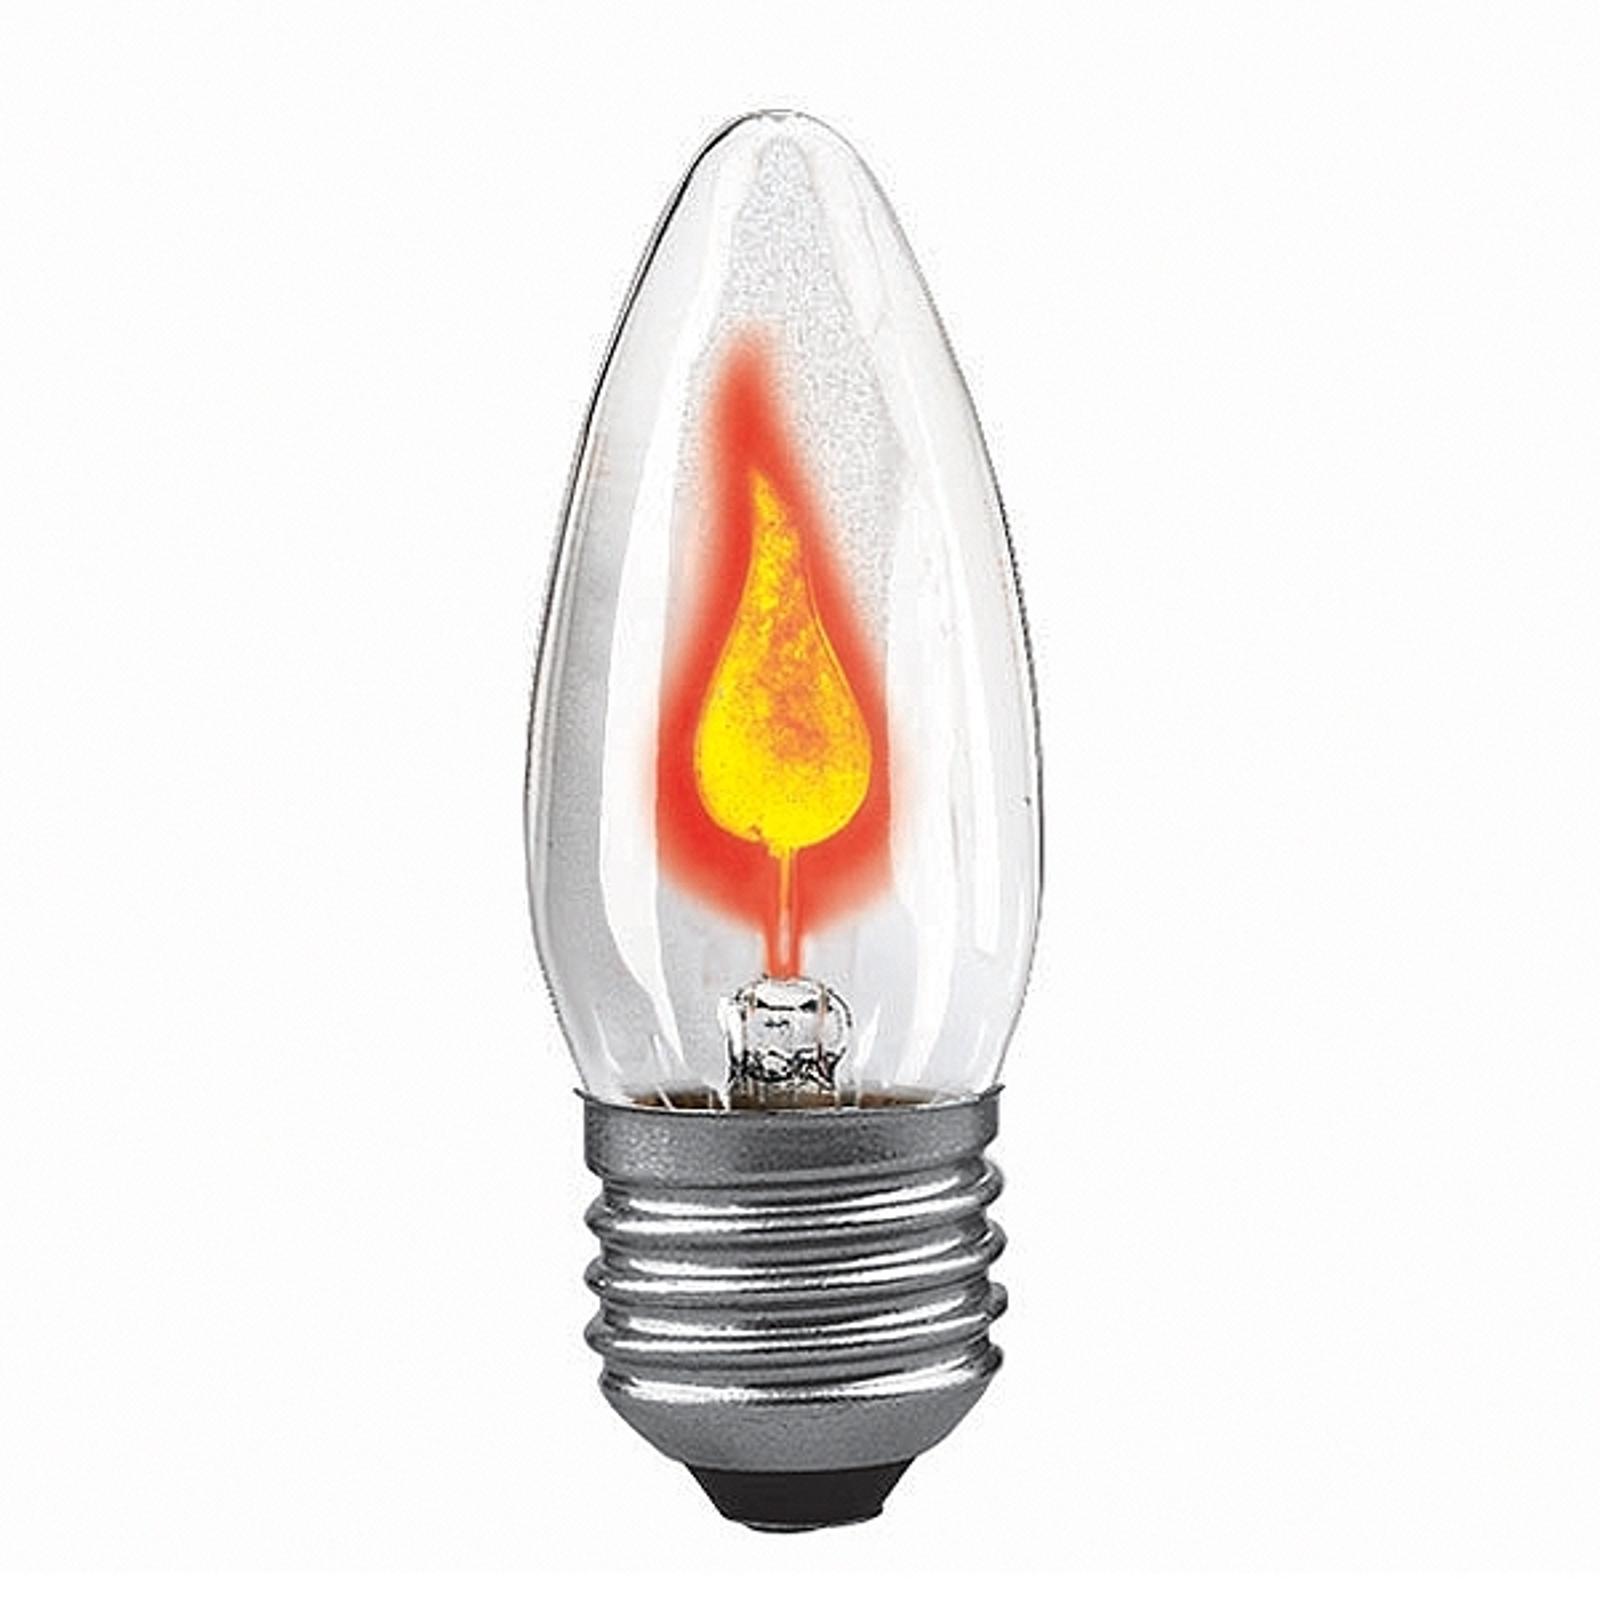 E27 3W lampadina a fiammella trasparente